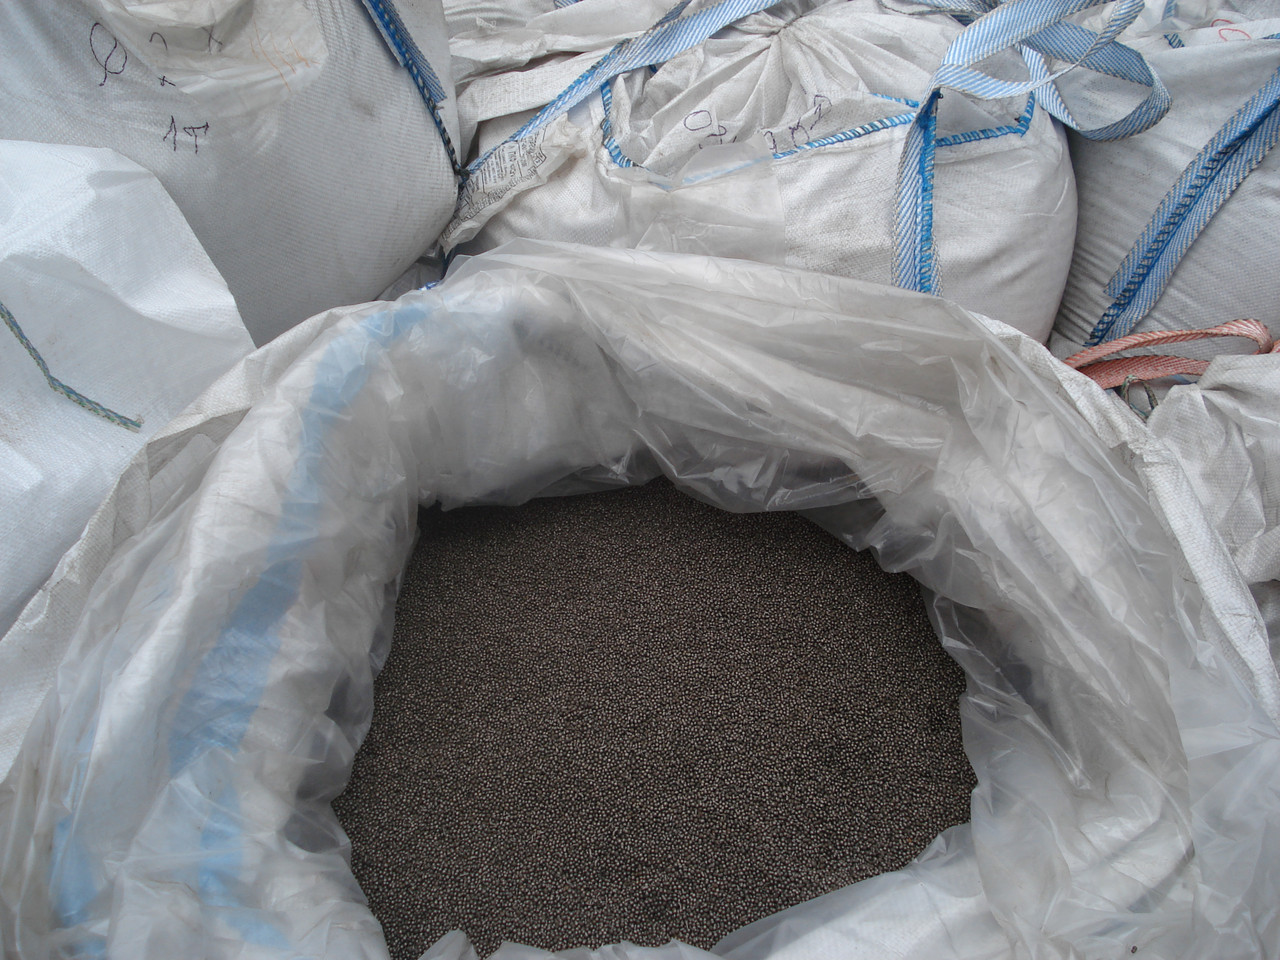 Дробь литая чугунная и стальная   ГОСТ 11964-81 0.3...6.0 мм